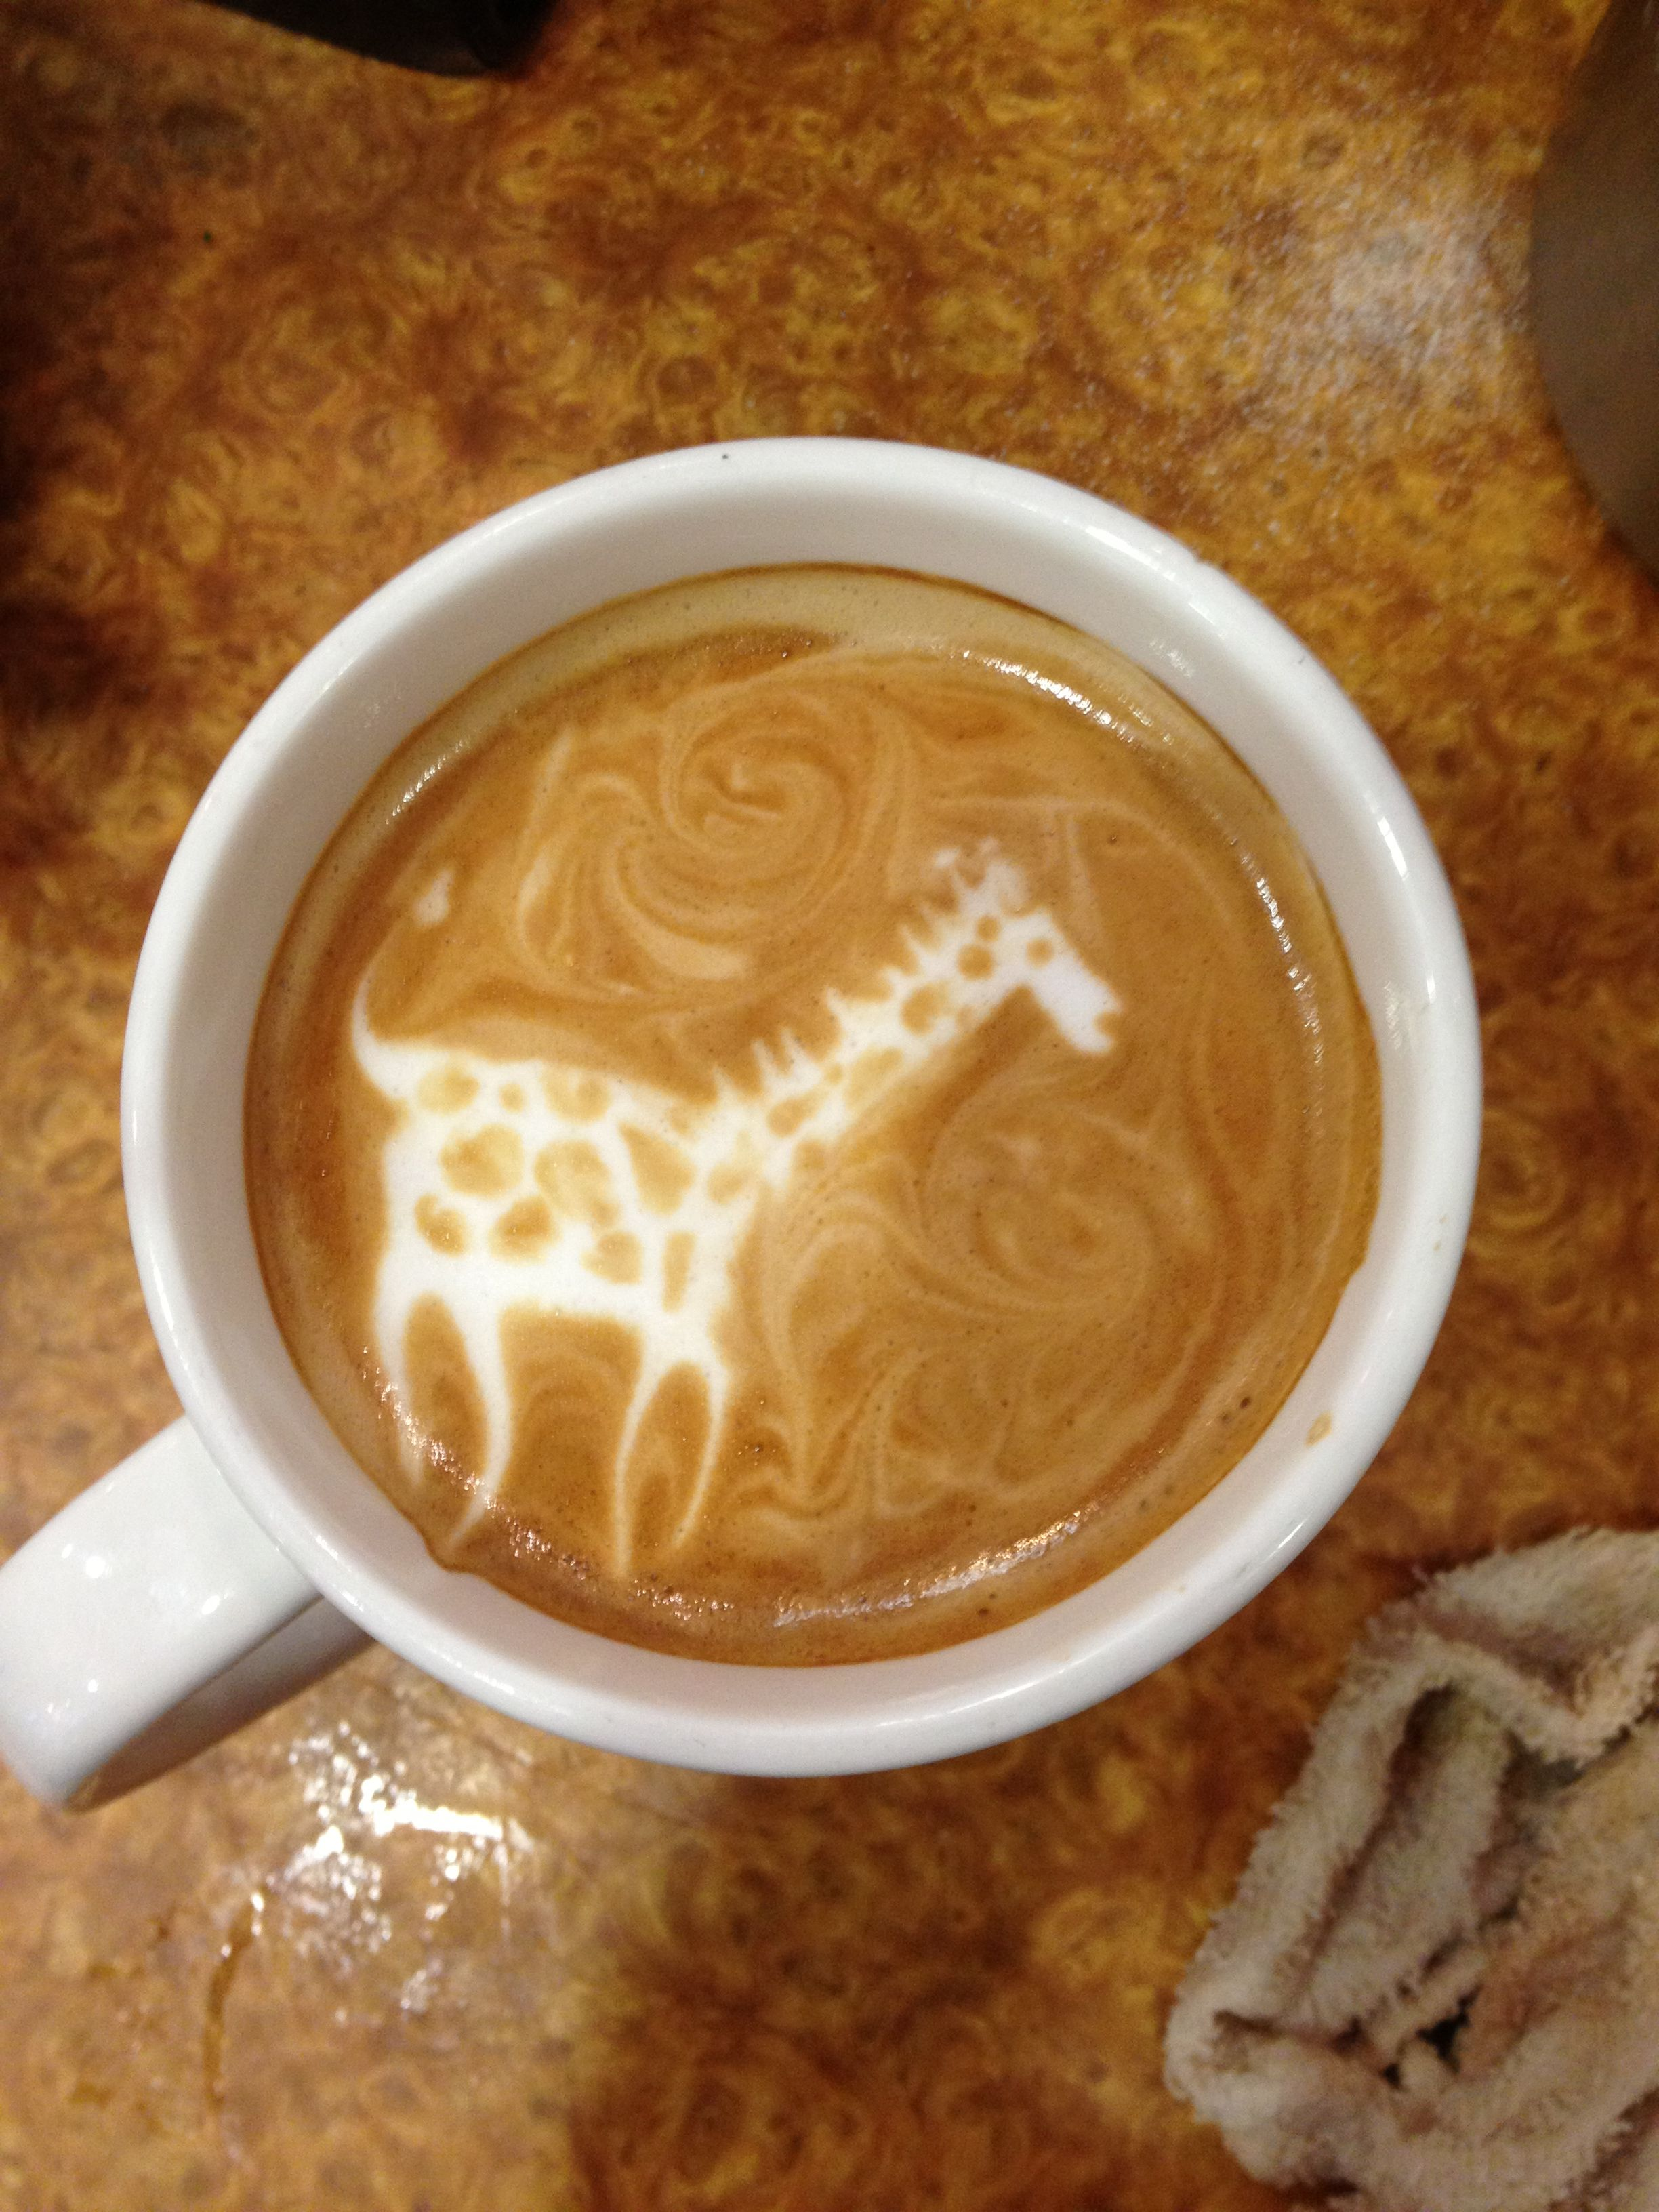 Latte Art Made At Terra Bella Bakery Cafe In Anchorage Alaska Bakery Cafe Food And Drink Latte